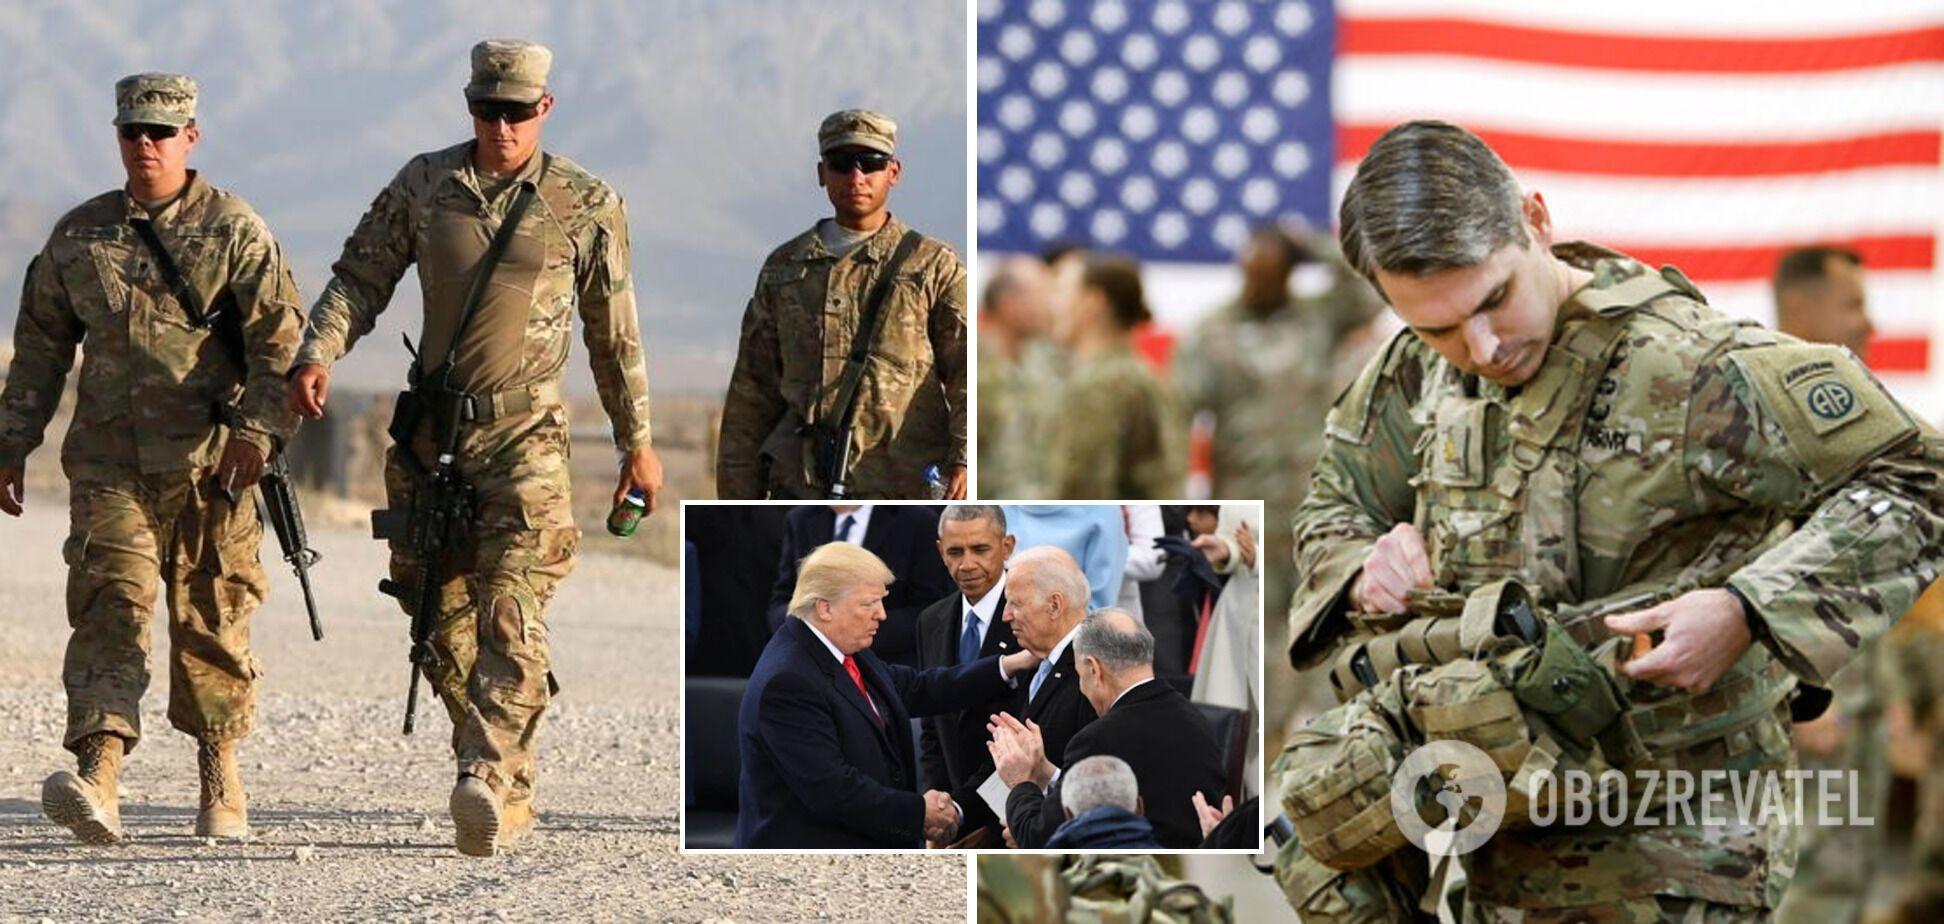 Хто наклав афганцям в штани? Байден!